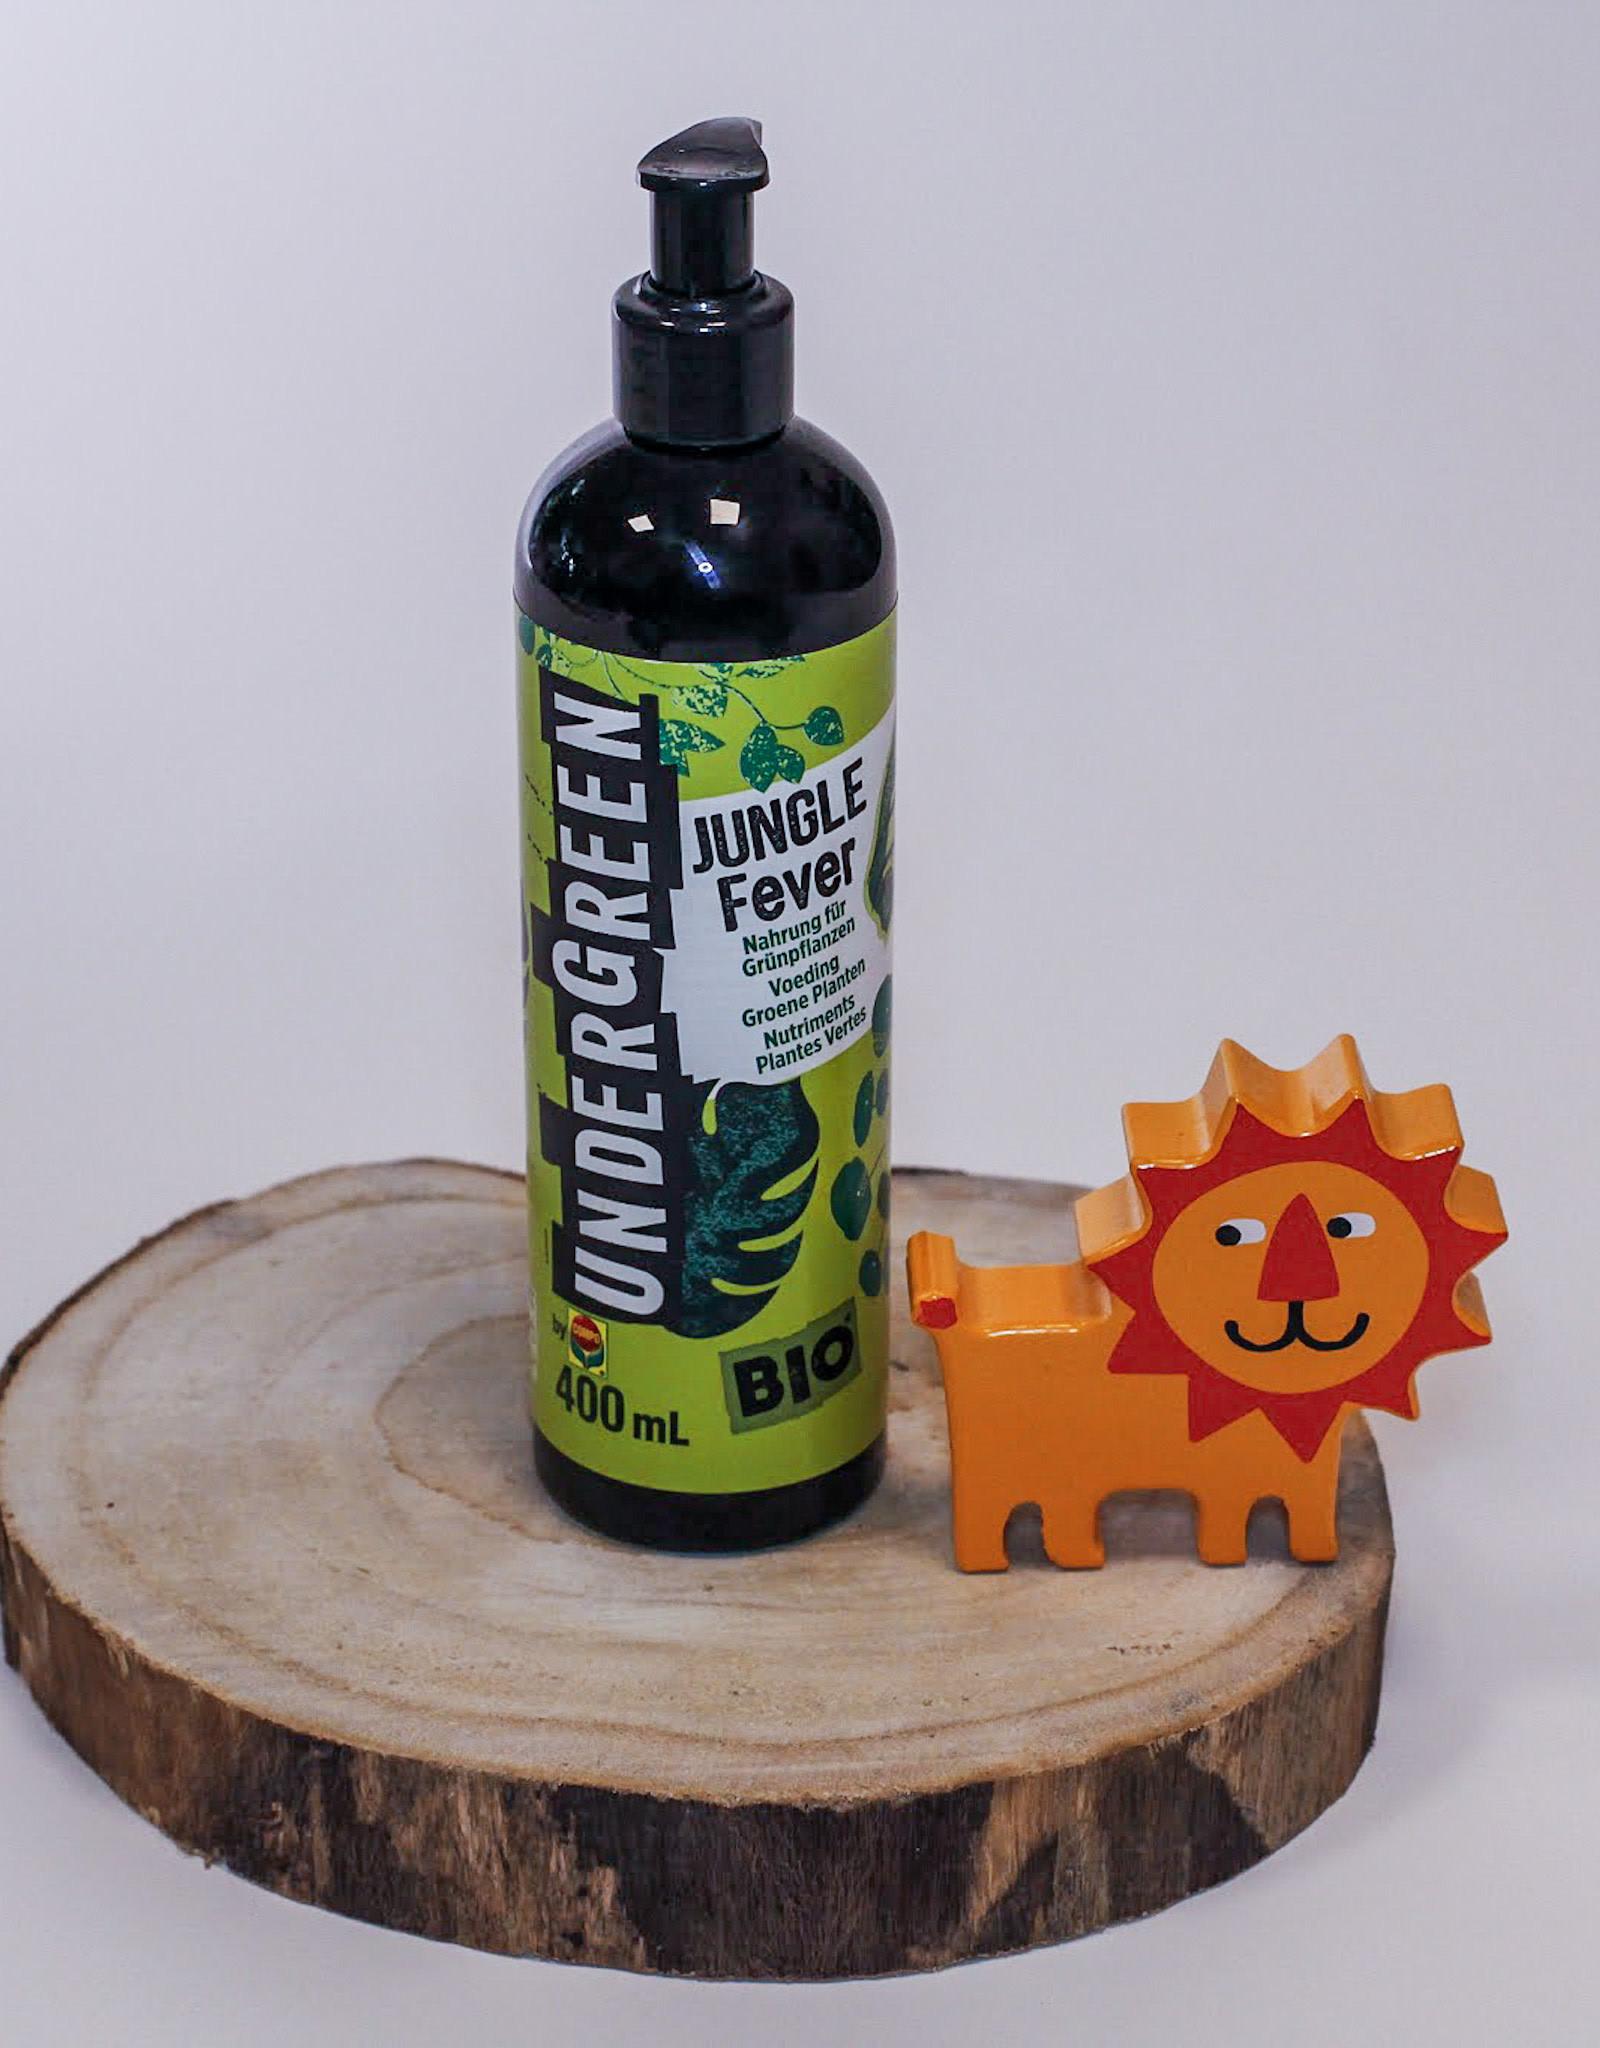 Undergreen jungle fever